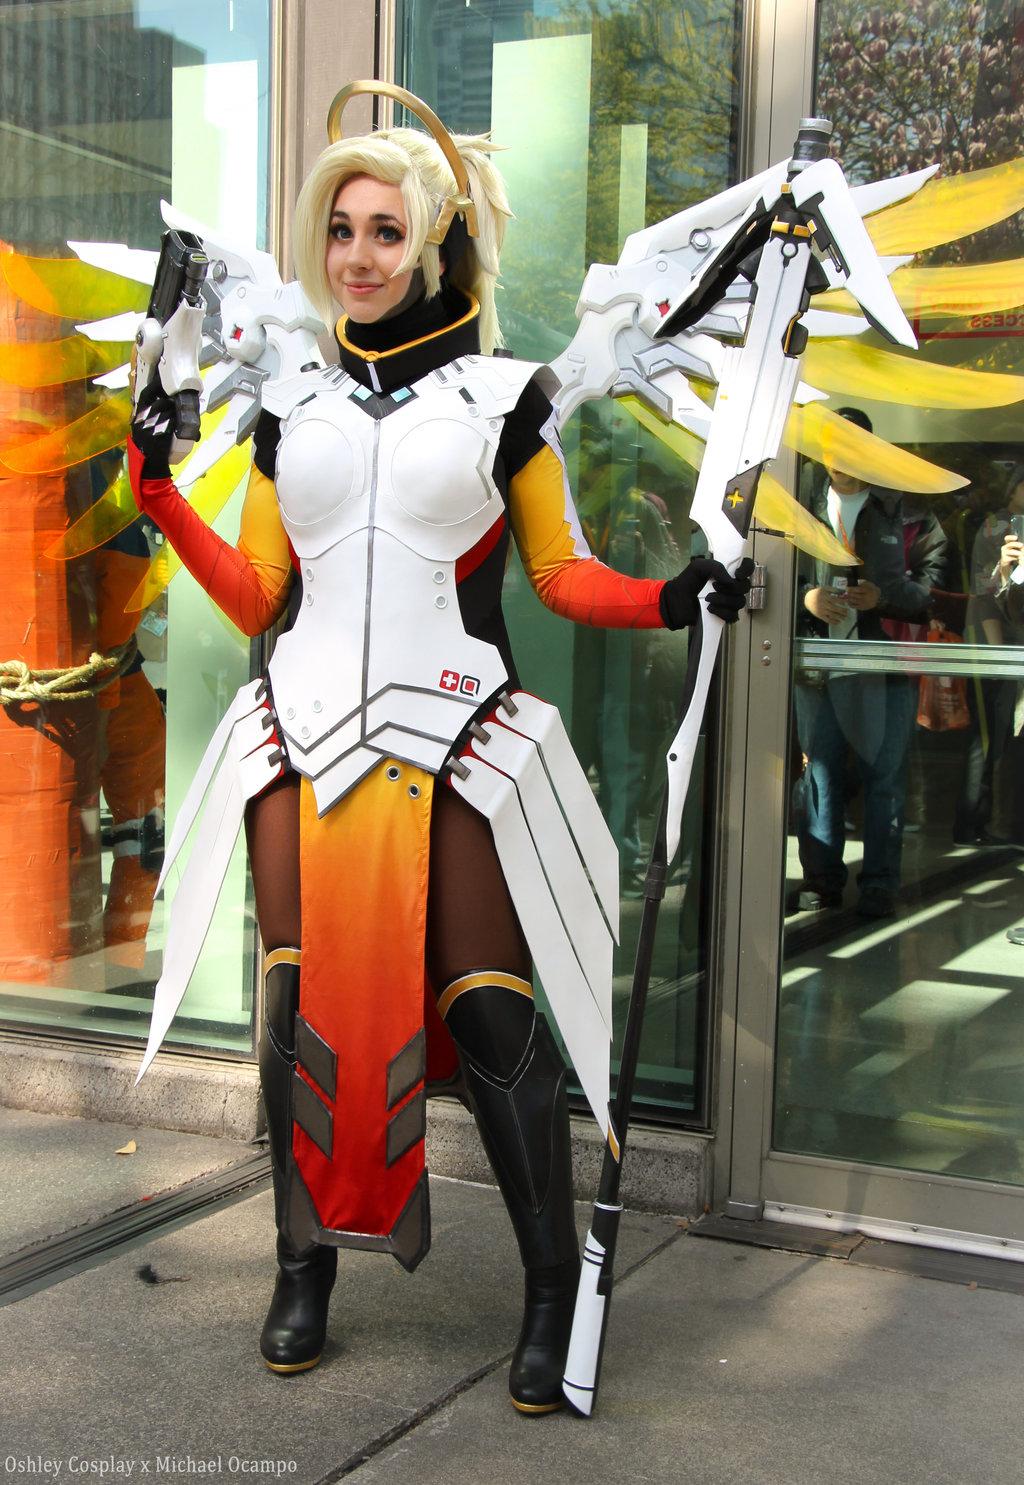 cosplay_This Overwatch Cosplay Shows No Mercy « Adafruit Industries – Makers, hackers ...